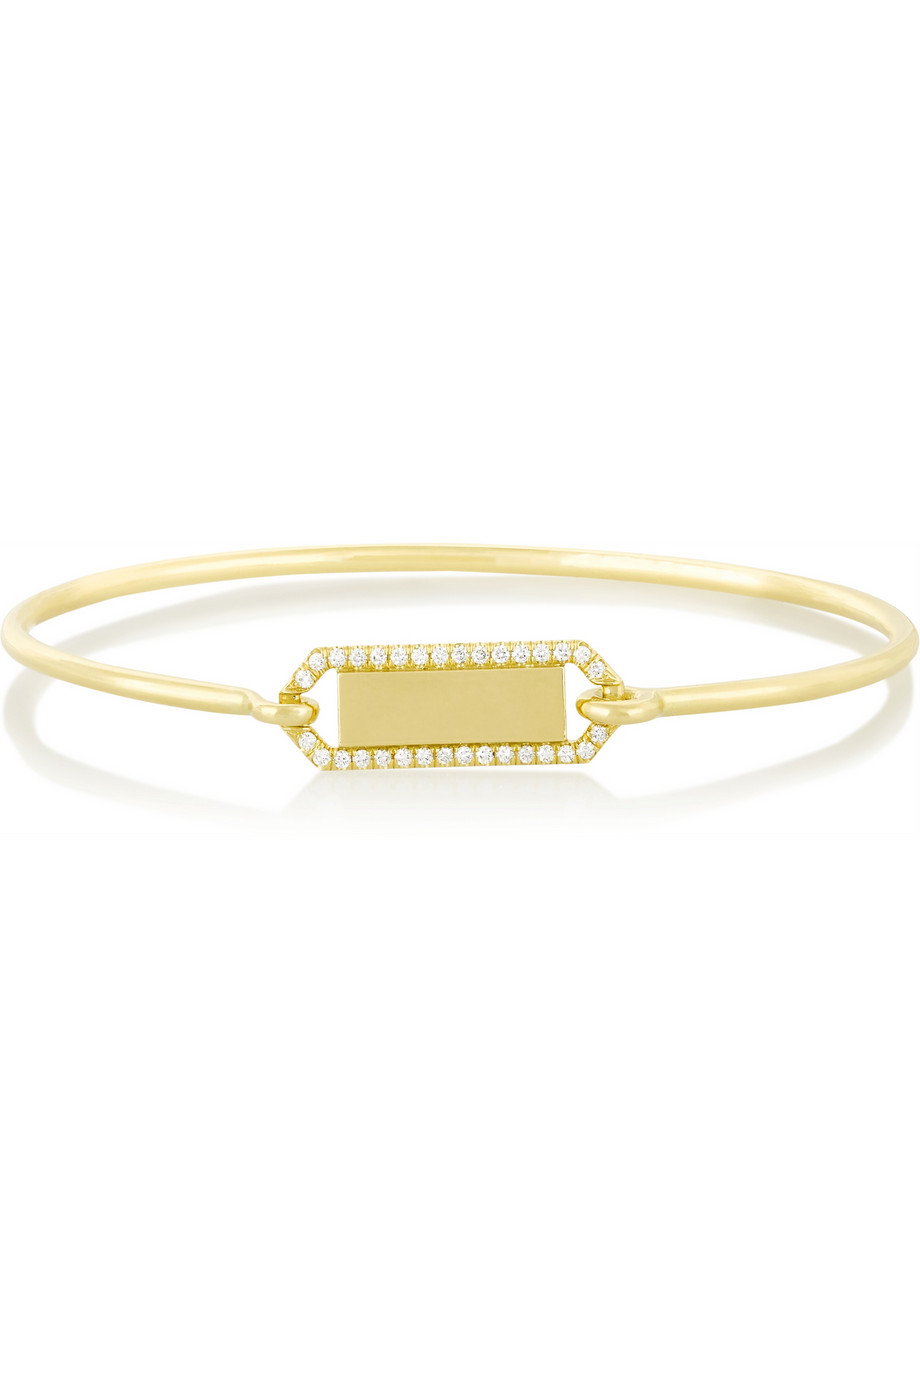 Jemma Wynne 18-karat Gold And Diamond Bracelet Meb4LuyLwv